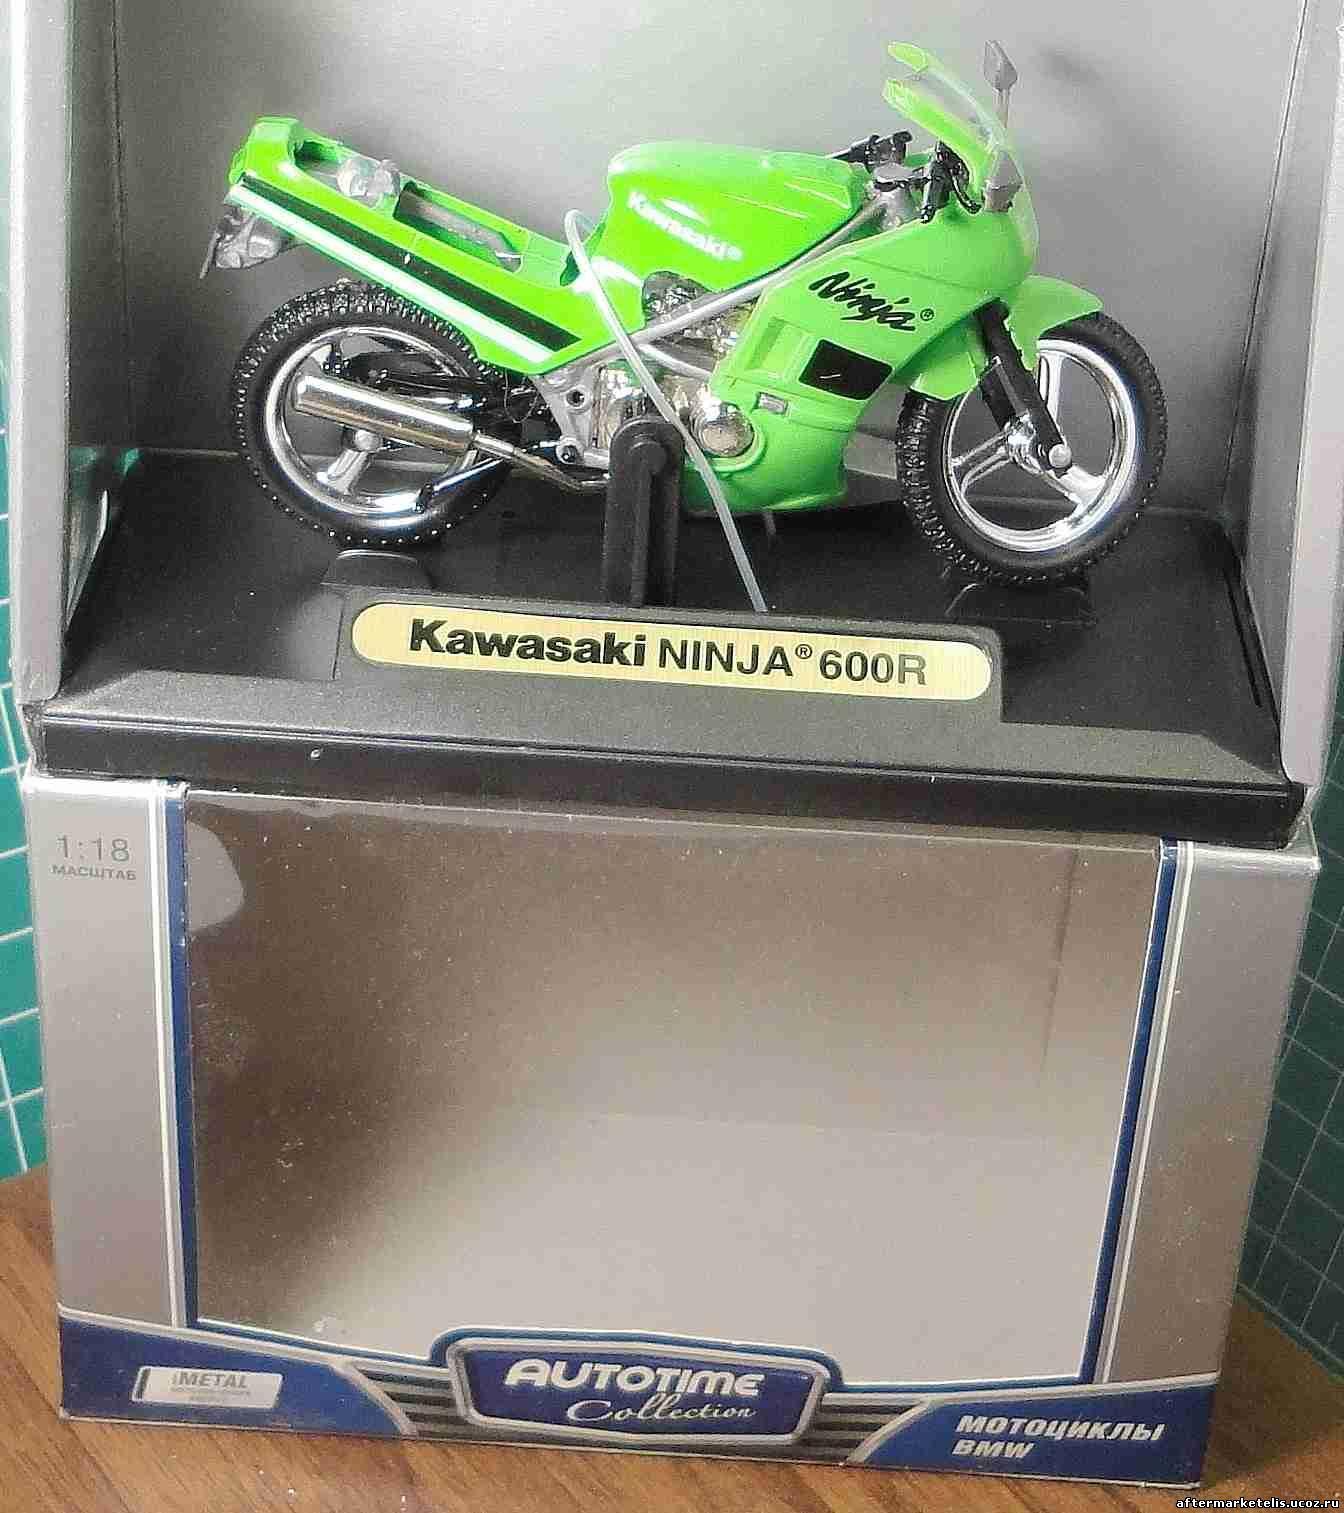 Kawasaki Ninja 600 R MotorMax